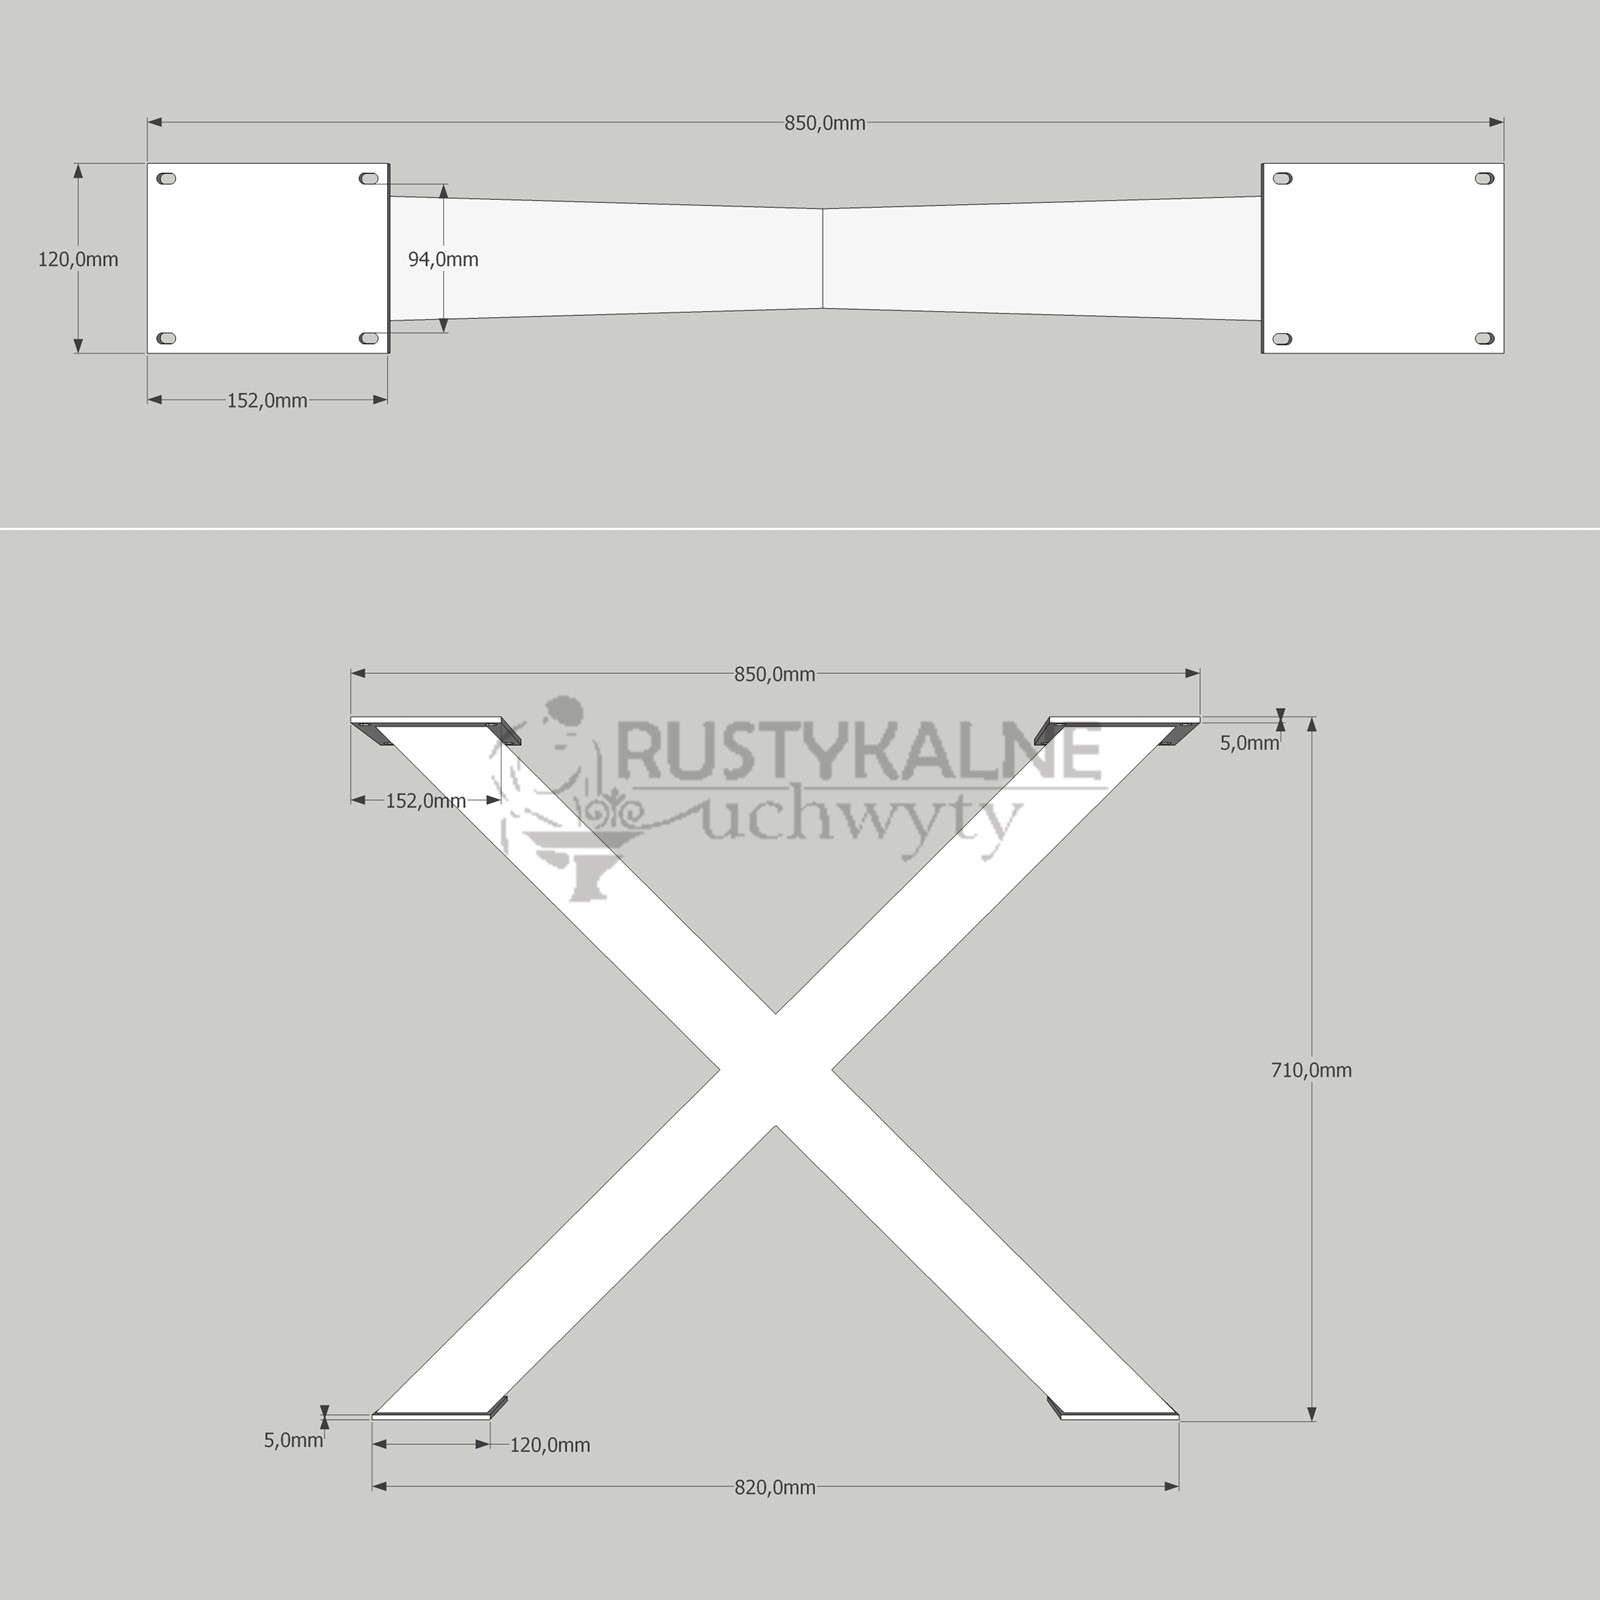 rysunek techniczny nogi krzyzak